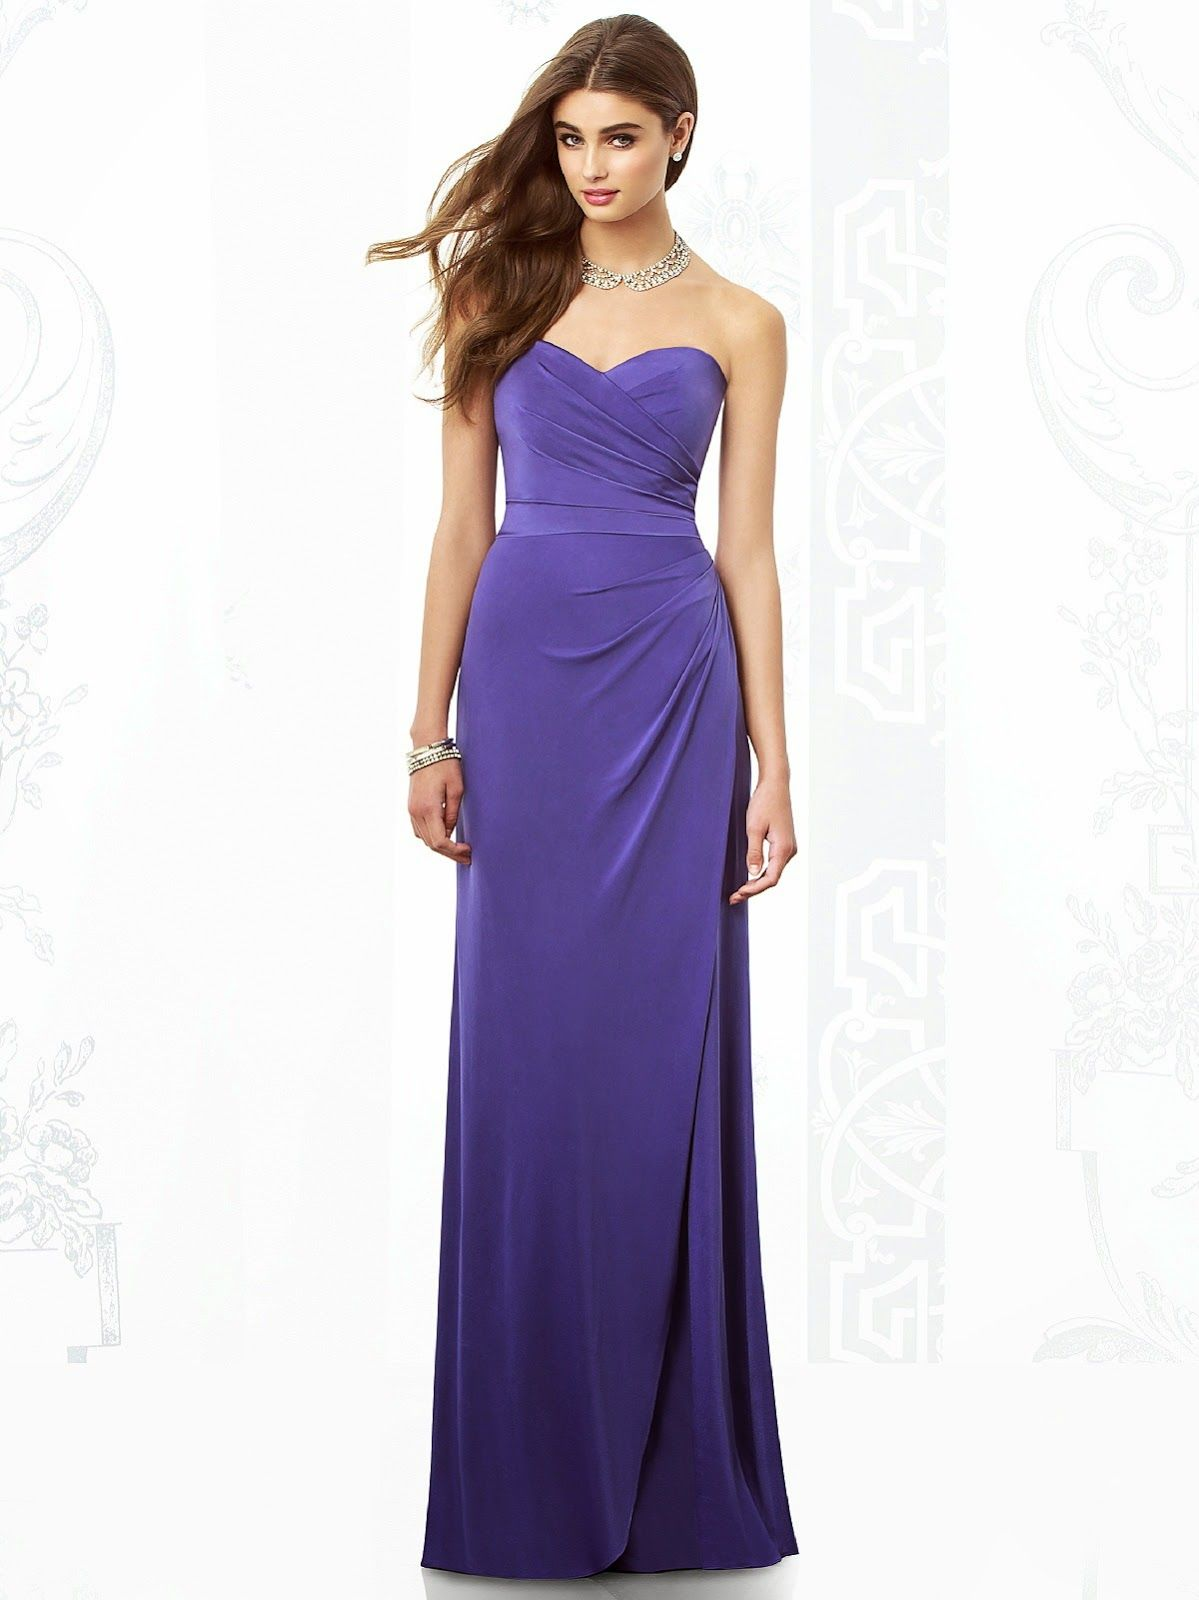 Pin de Maitane Sainz en Formas Vestidos | Pinterest | Vestidos de ...